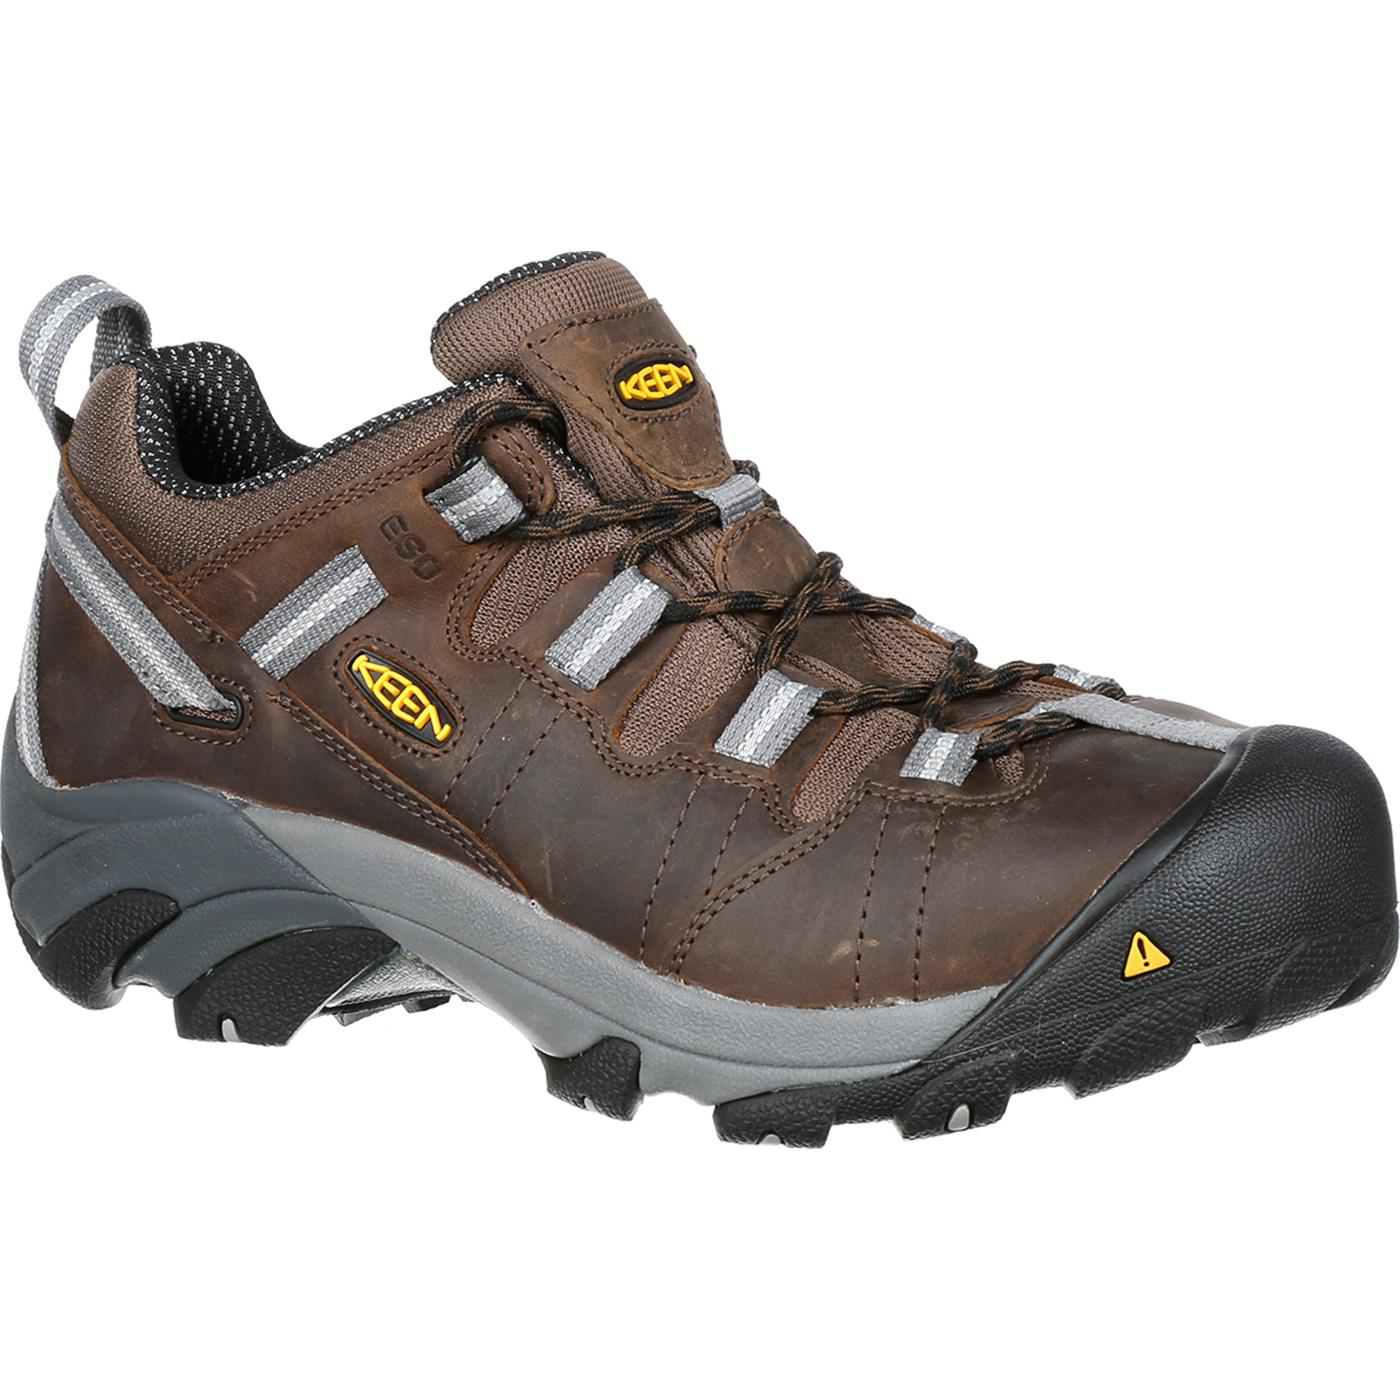 d6098108bc KEEN Utility® Detroit Steel Toe Static-Dissipative Work Athletic ShoeKEEN  Utility® Detroit Steel Toe Static-Dissipative Work Athletic Shoe